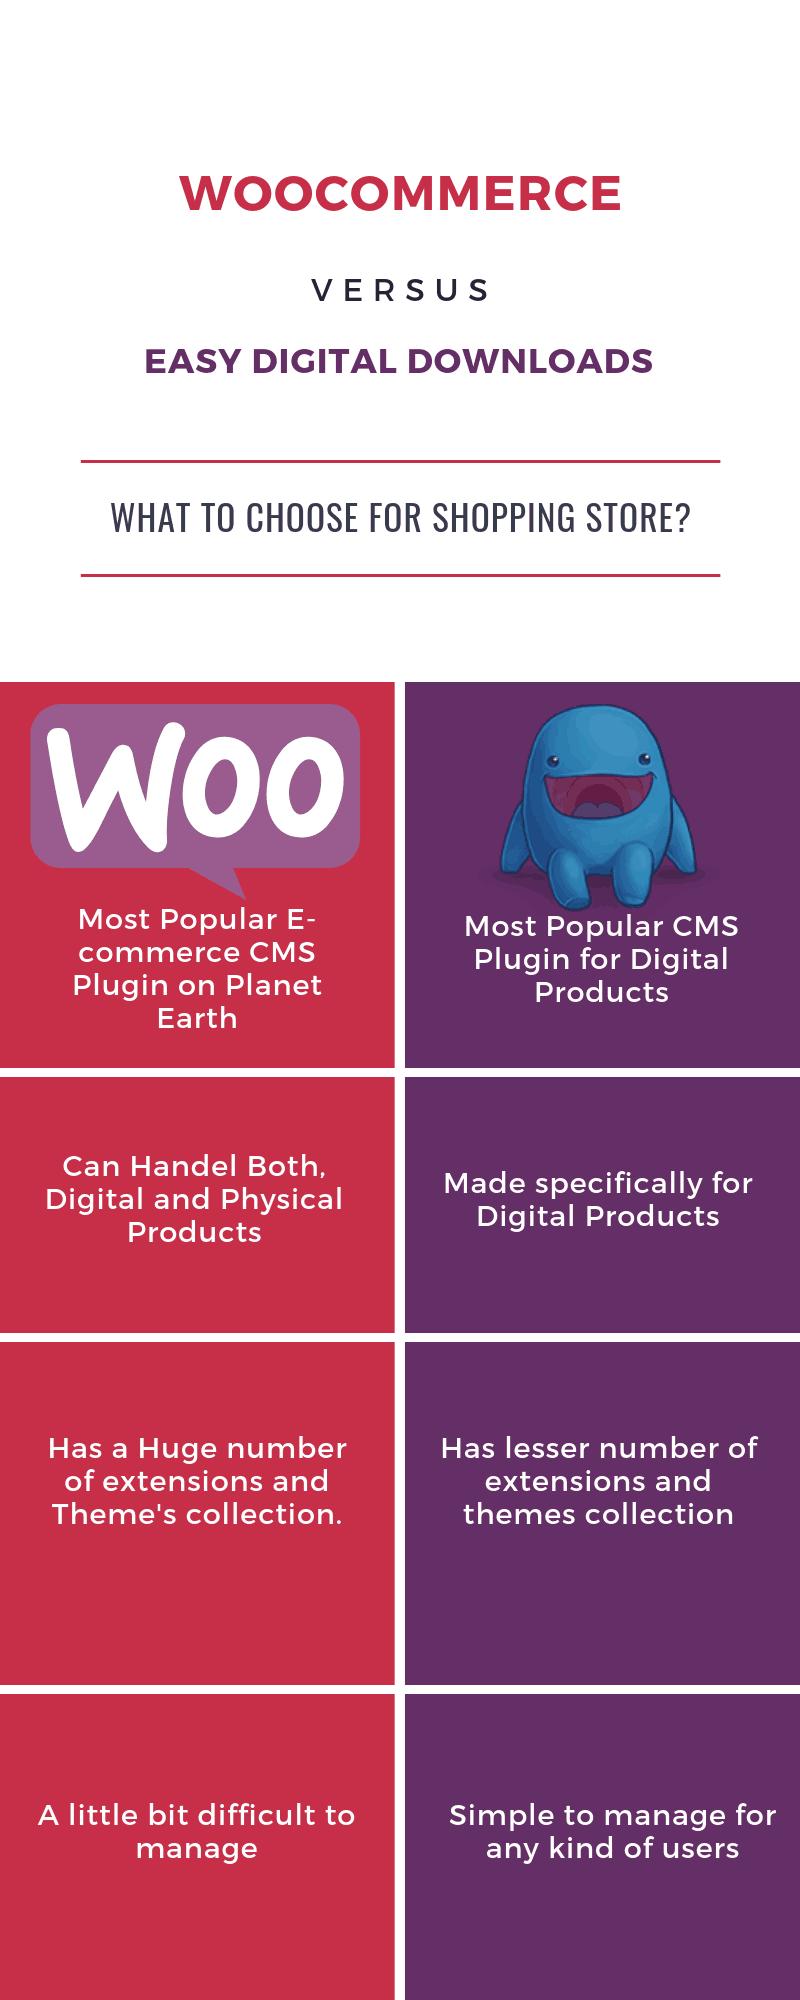 WooCommerce vs Easy Digital Downloads - Infographic